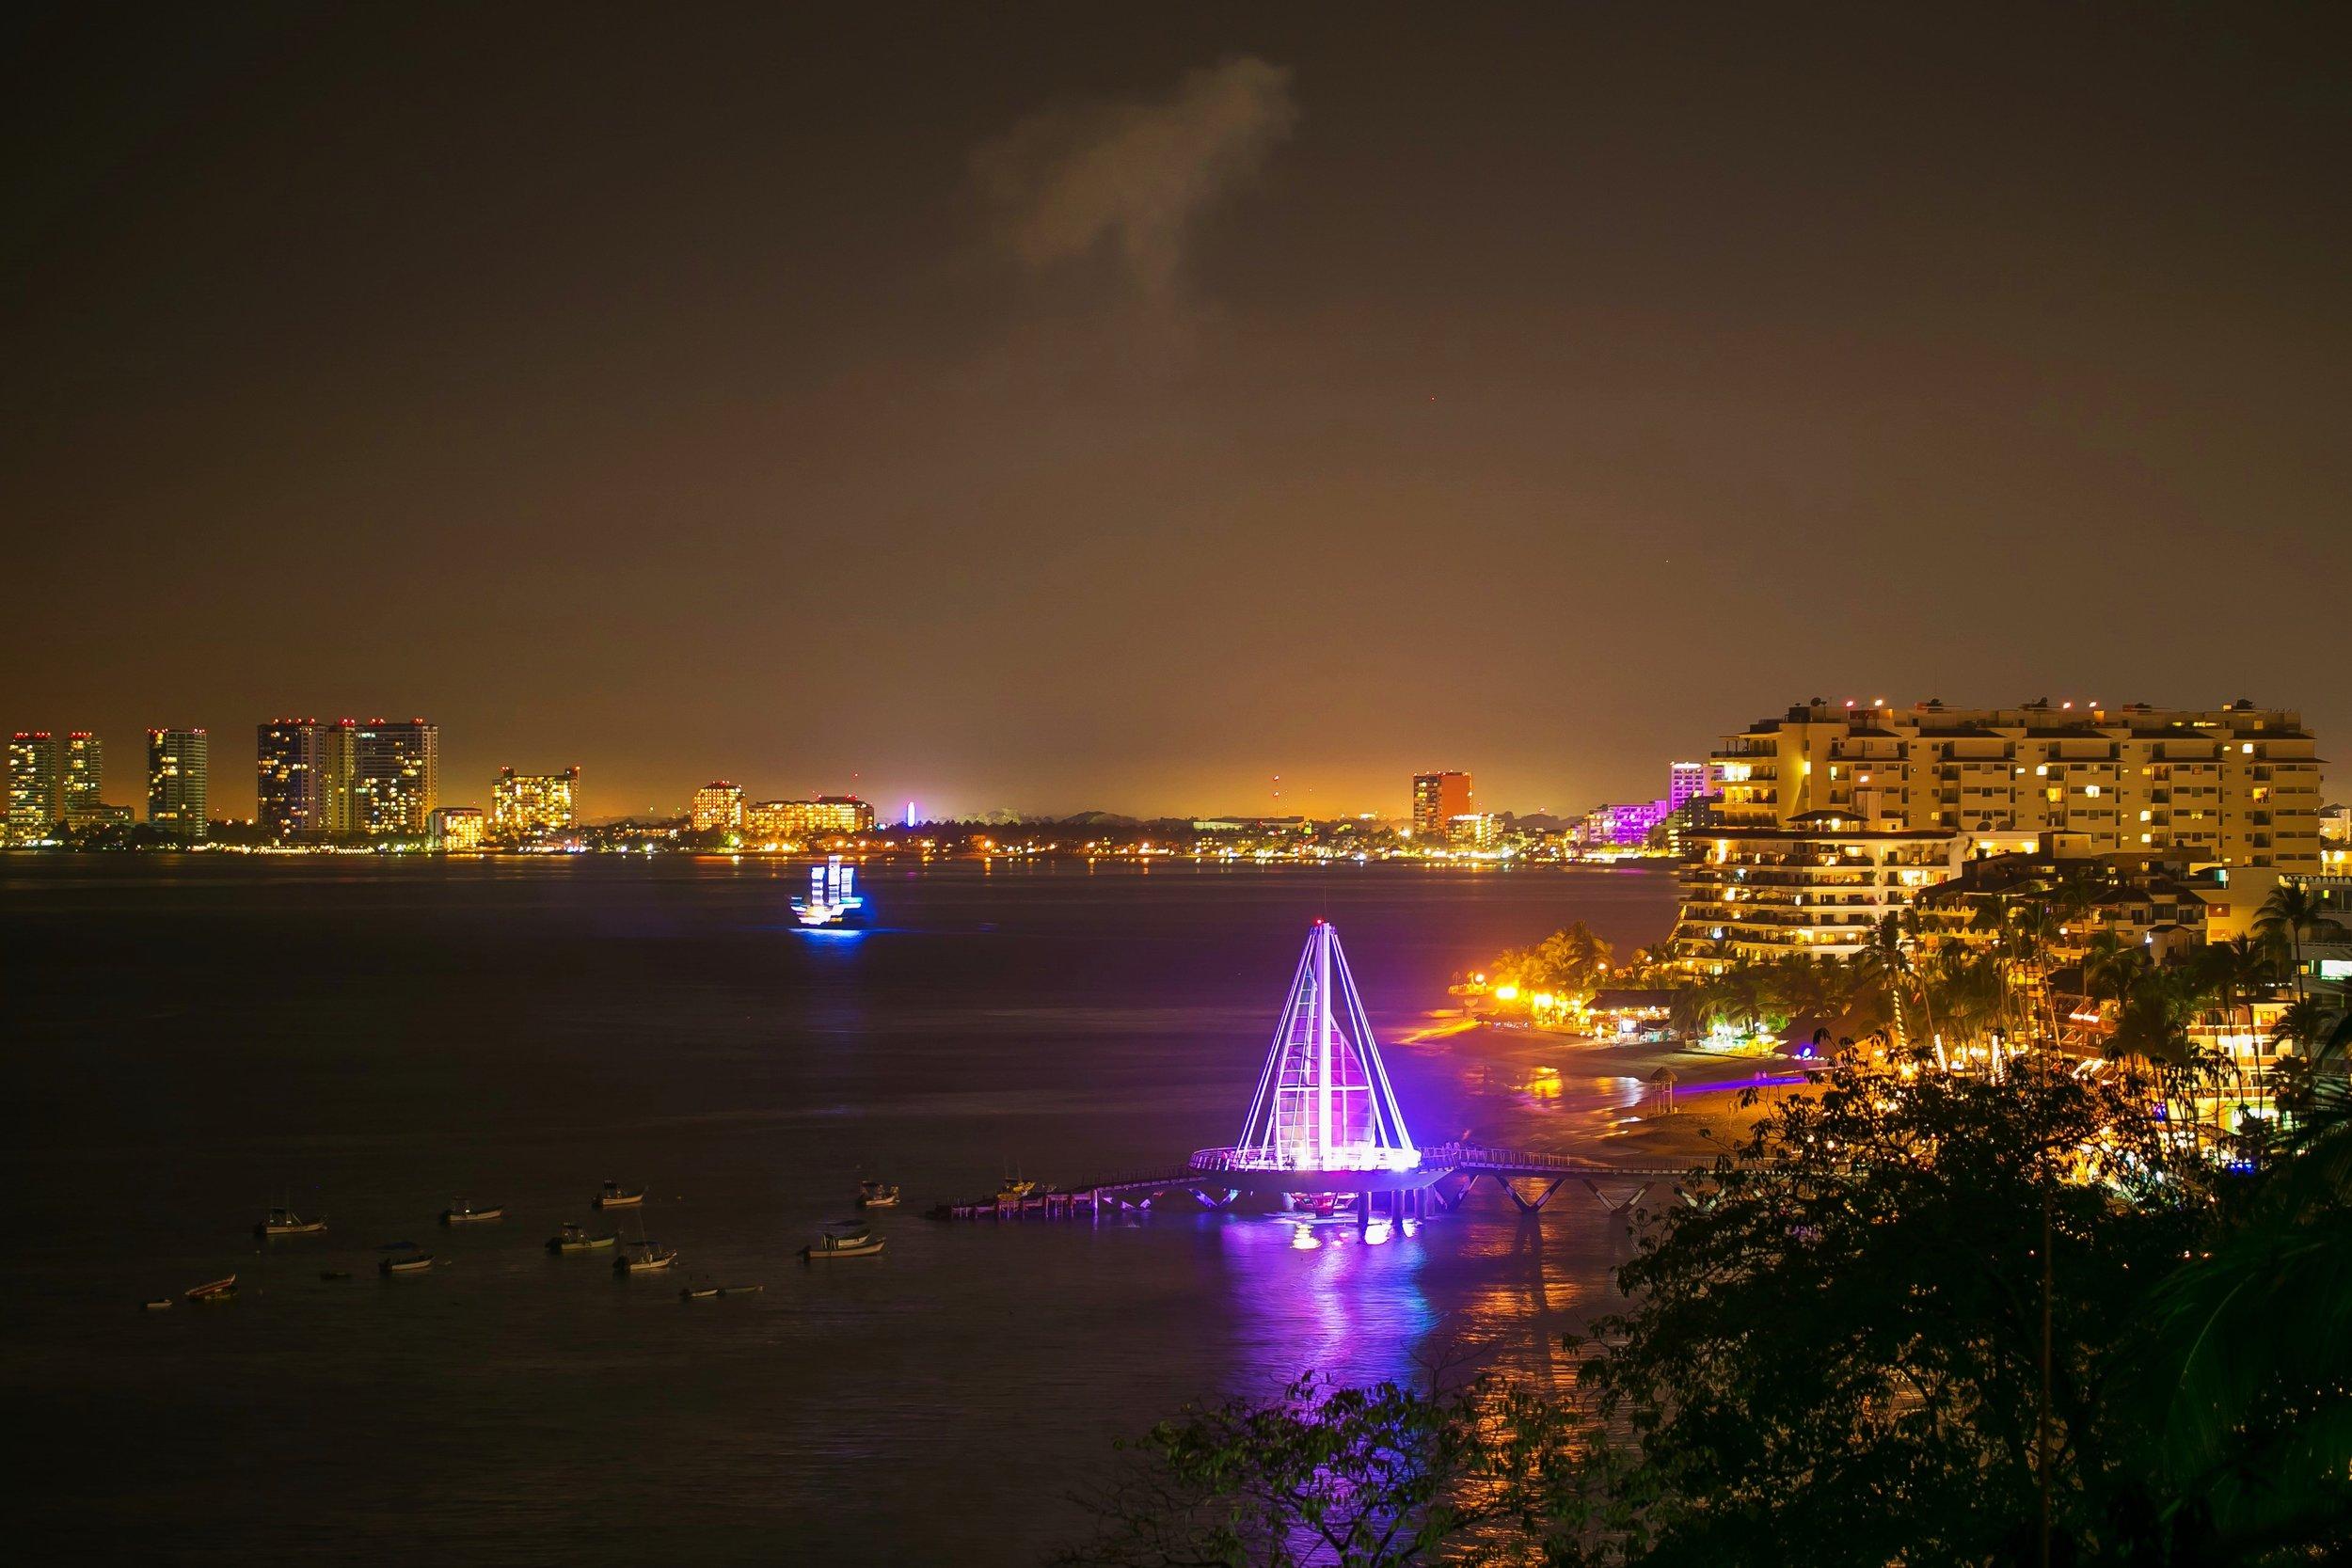 Vacation Vallarta Beachouse View